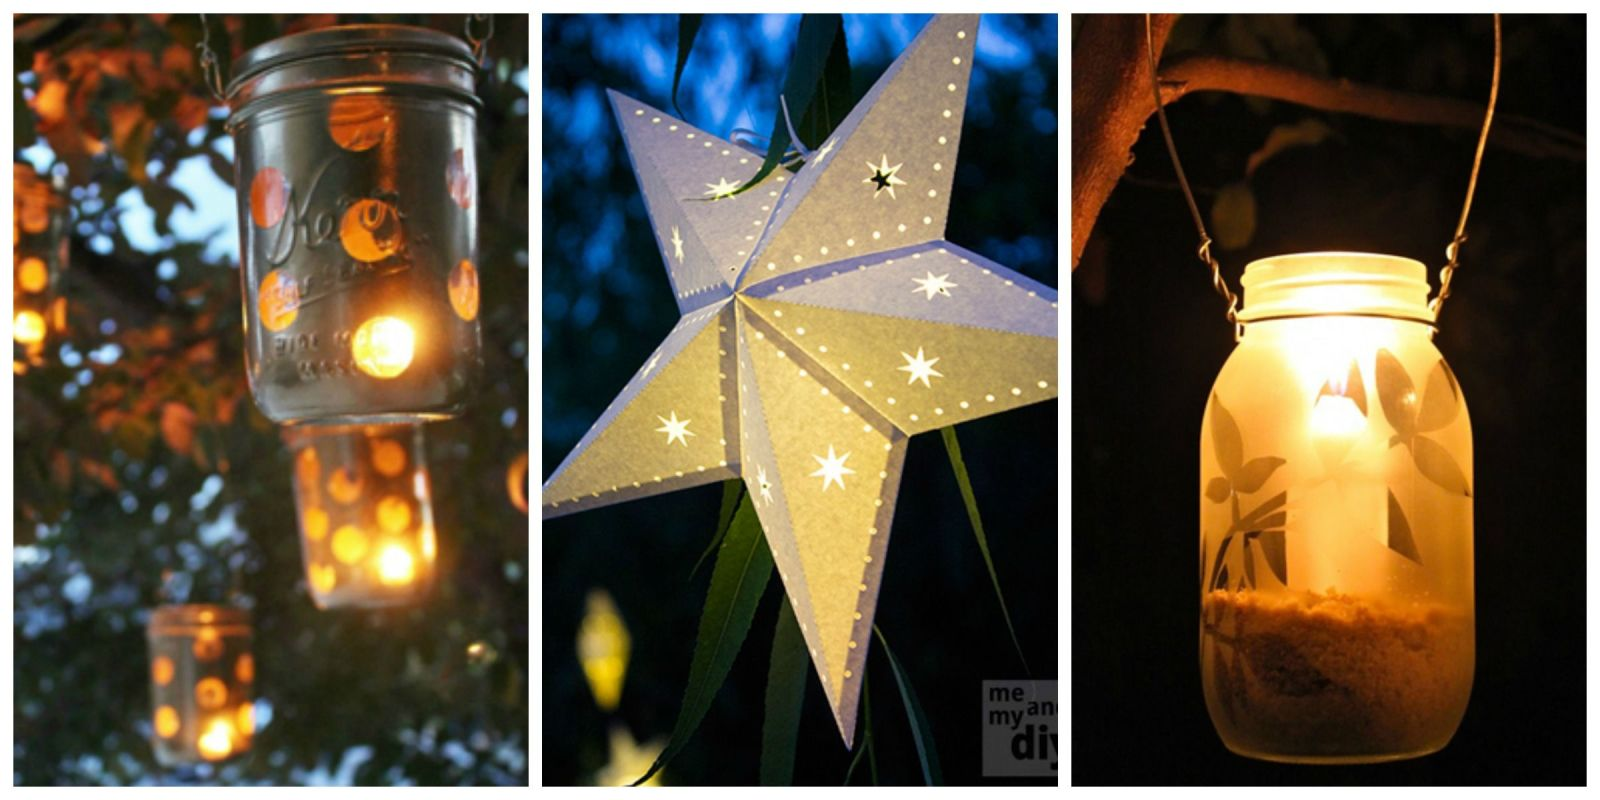 Diy lanterns outdoor lanterns for Diy lights ideas